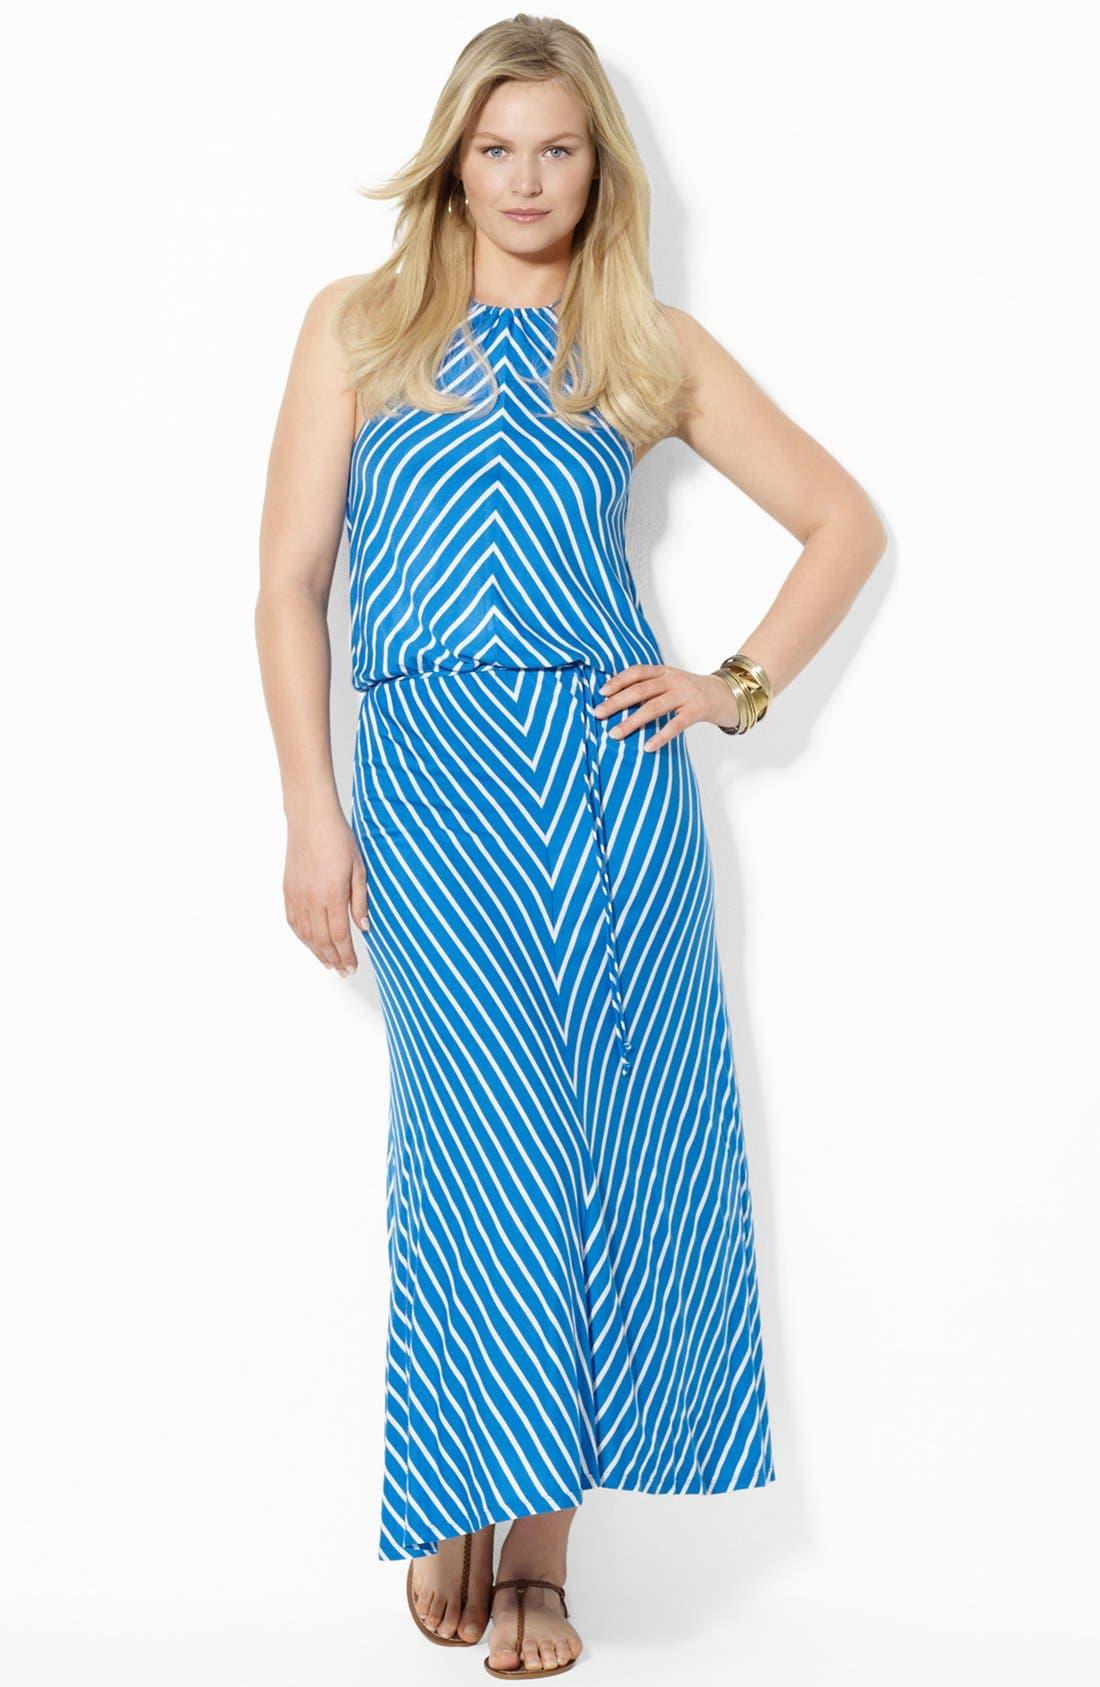 Alternate Image 1 Selected - Lauren Ralph Lauren Blouson Maxi Dress (Plus Size)